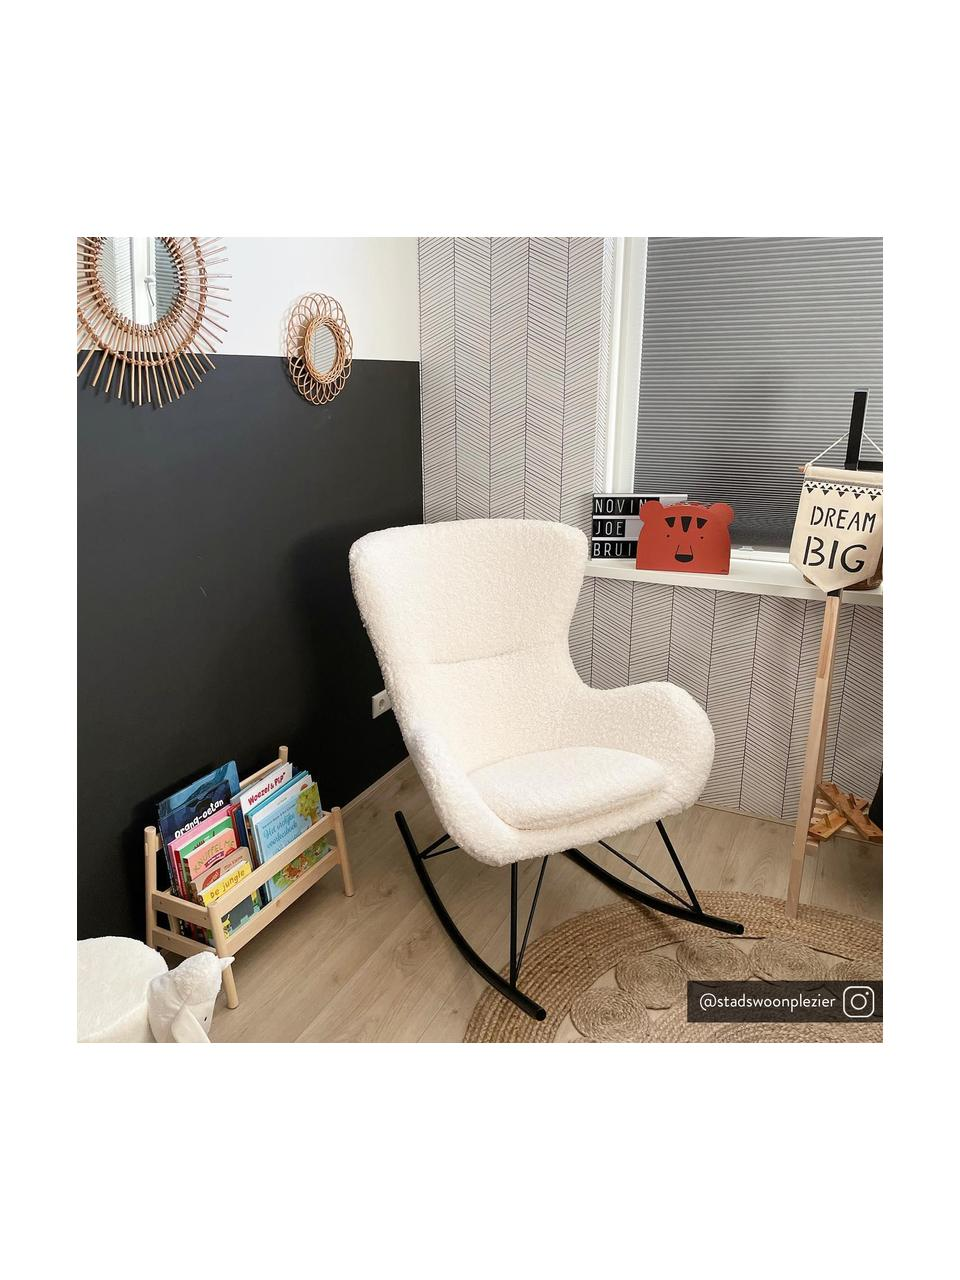 Sedia a dondolo in tessuto teddy Wing, Rivestimento: poliestere (tessuto teddy, Tessuto bianco crema, Larg. 66 x Prof. 102 cm